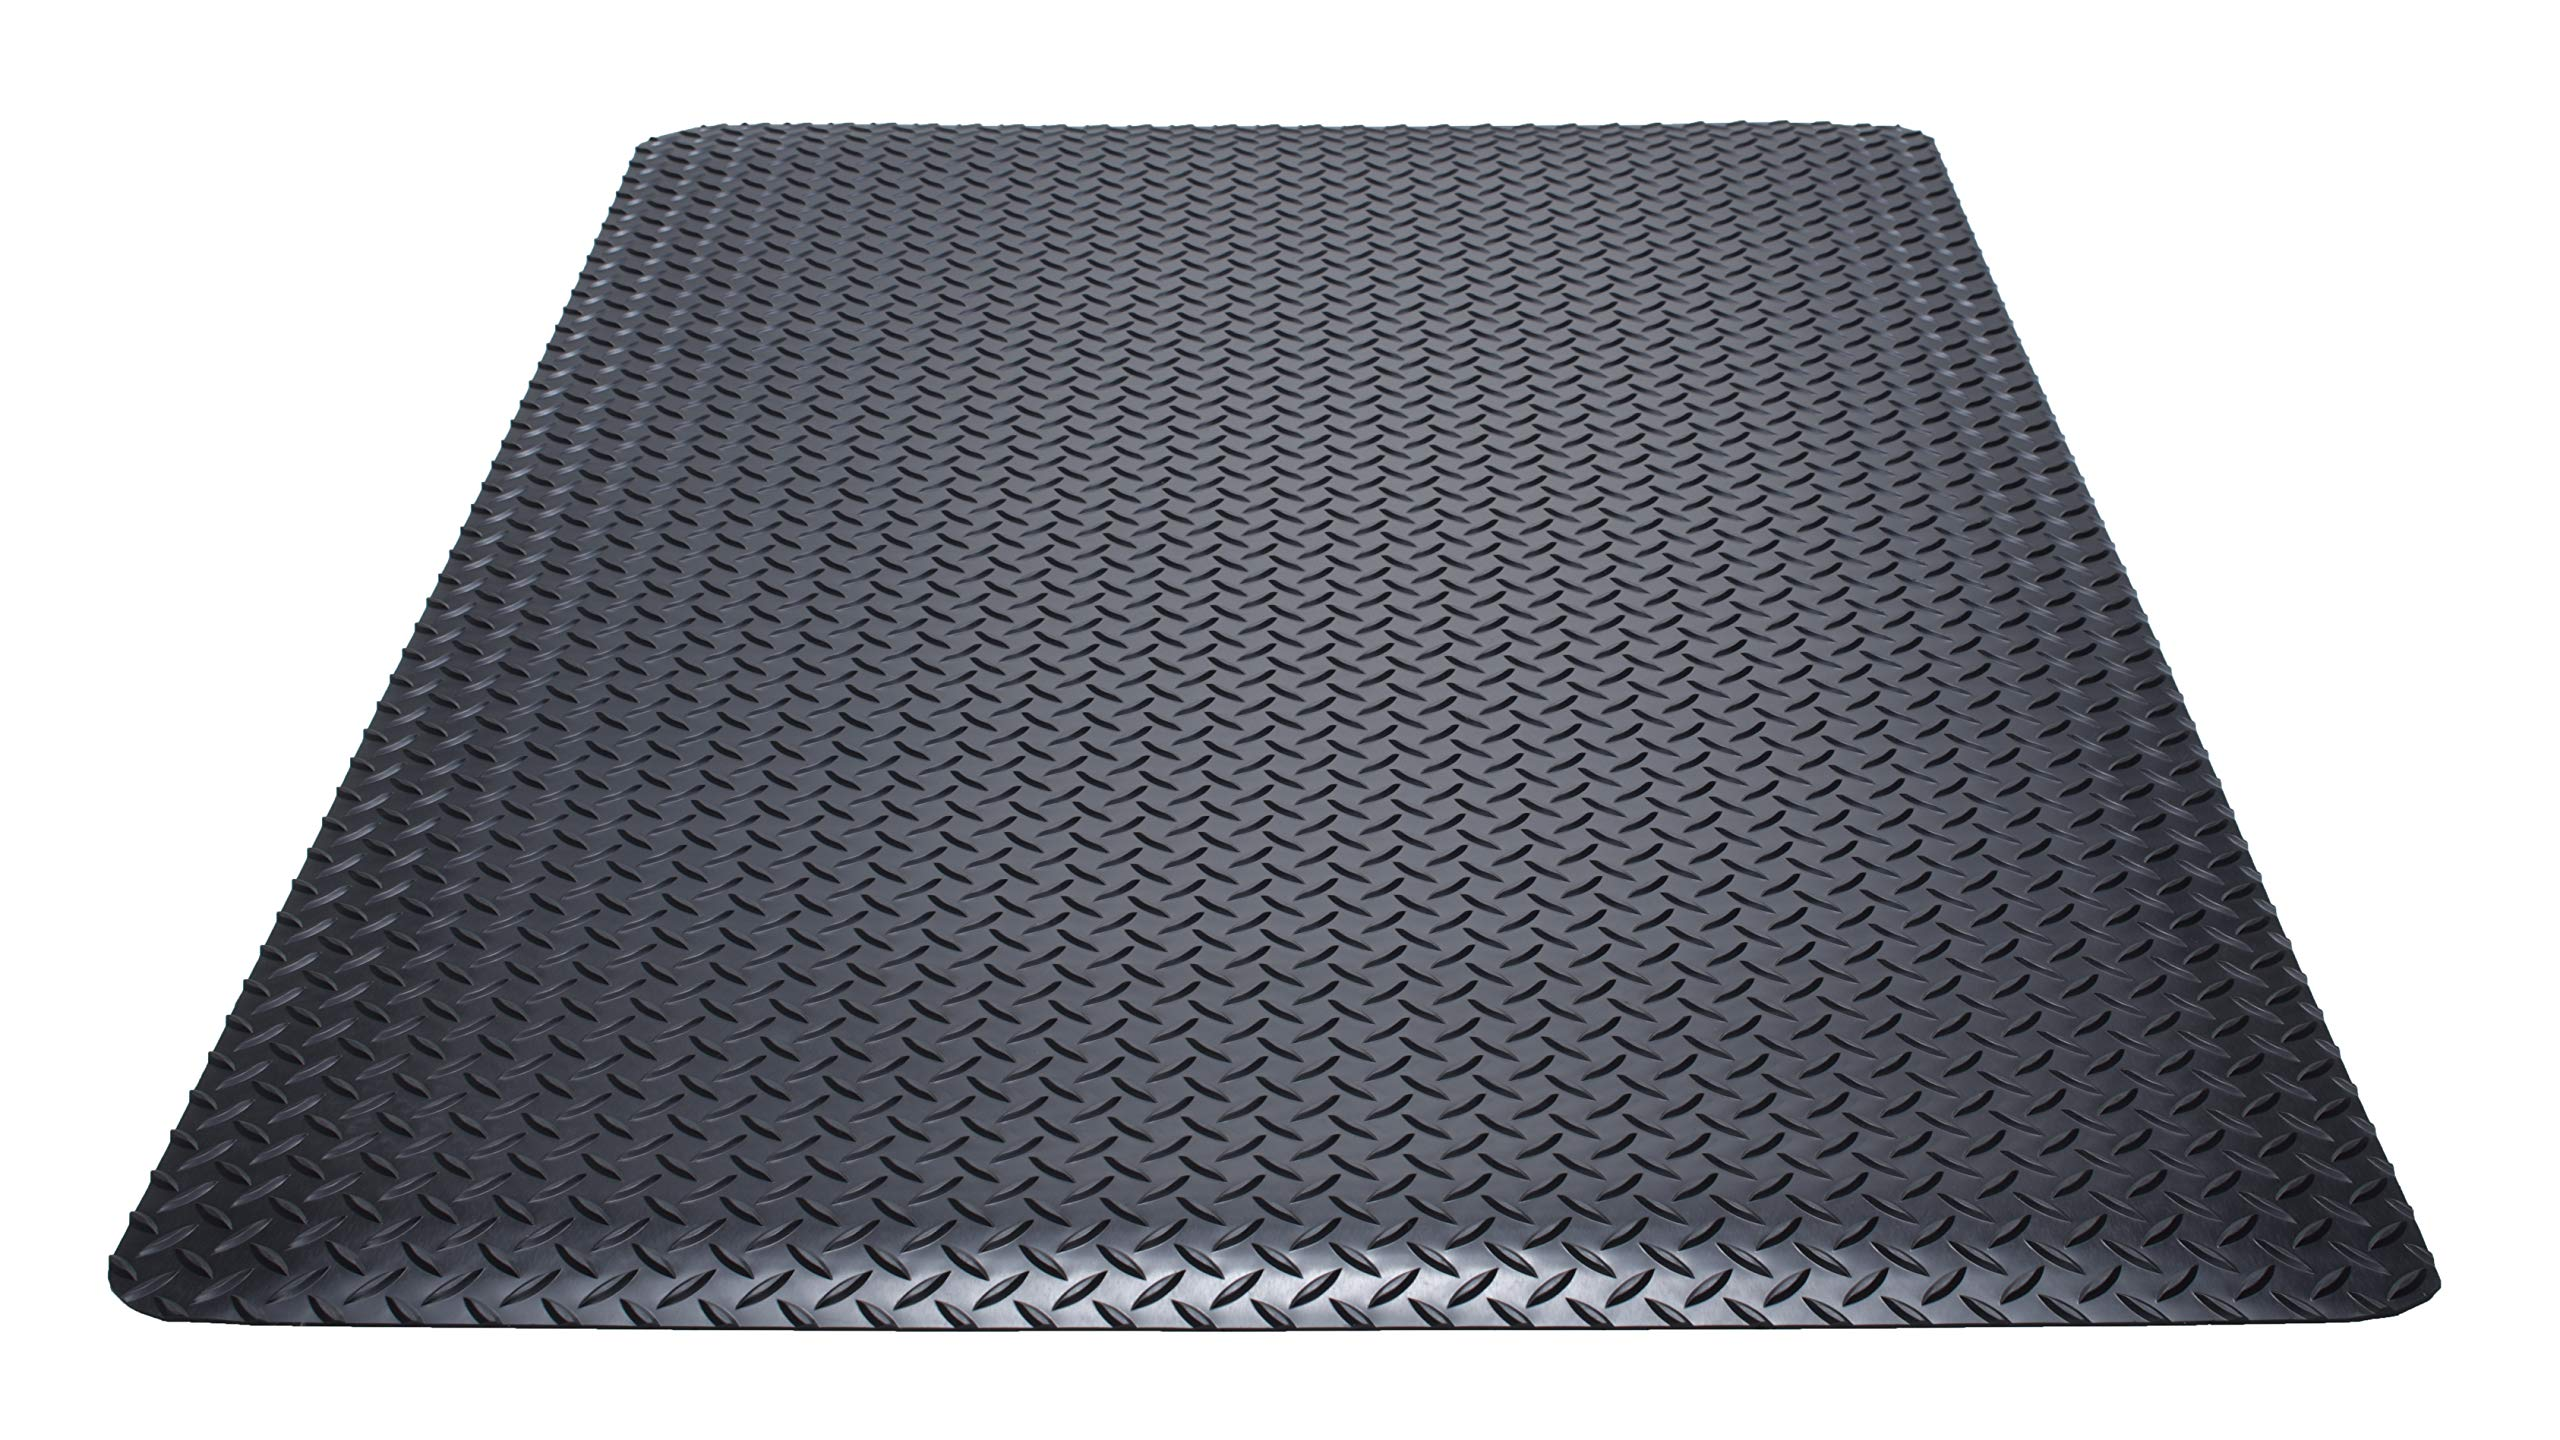 Guardian Safe Step Anti-Fatigue Floor Mat, Vinyl, 3'x12', Black